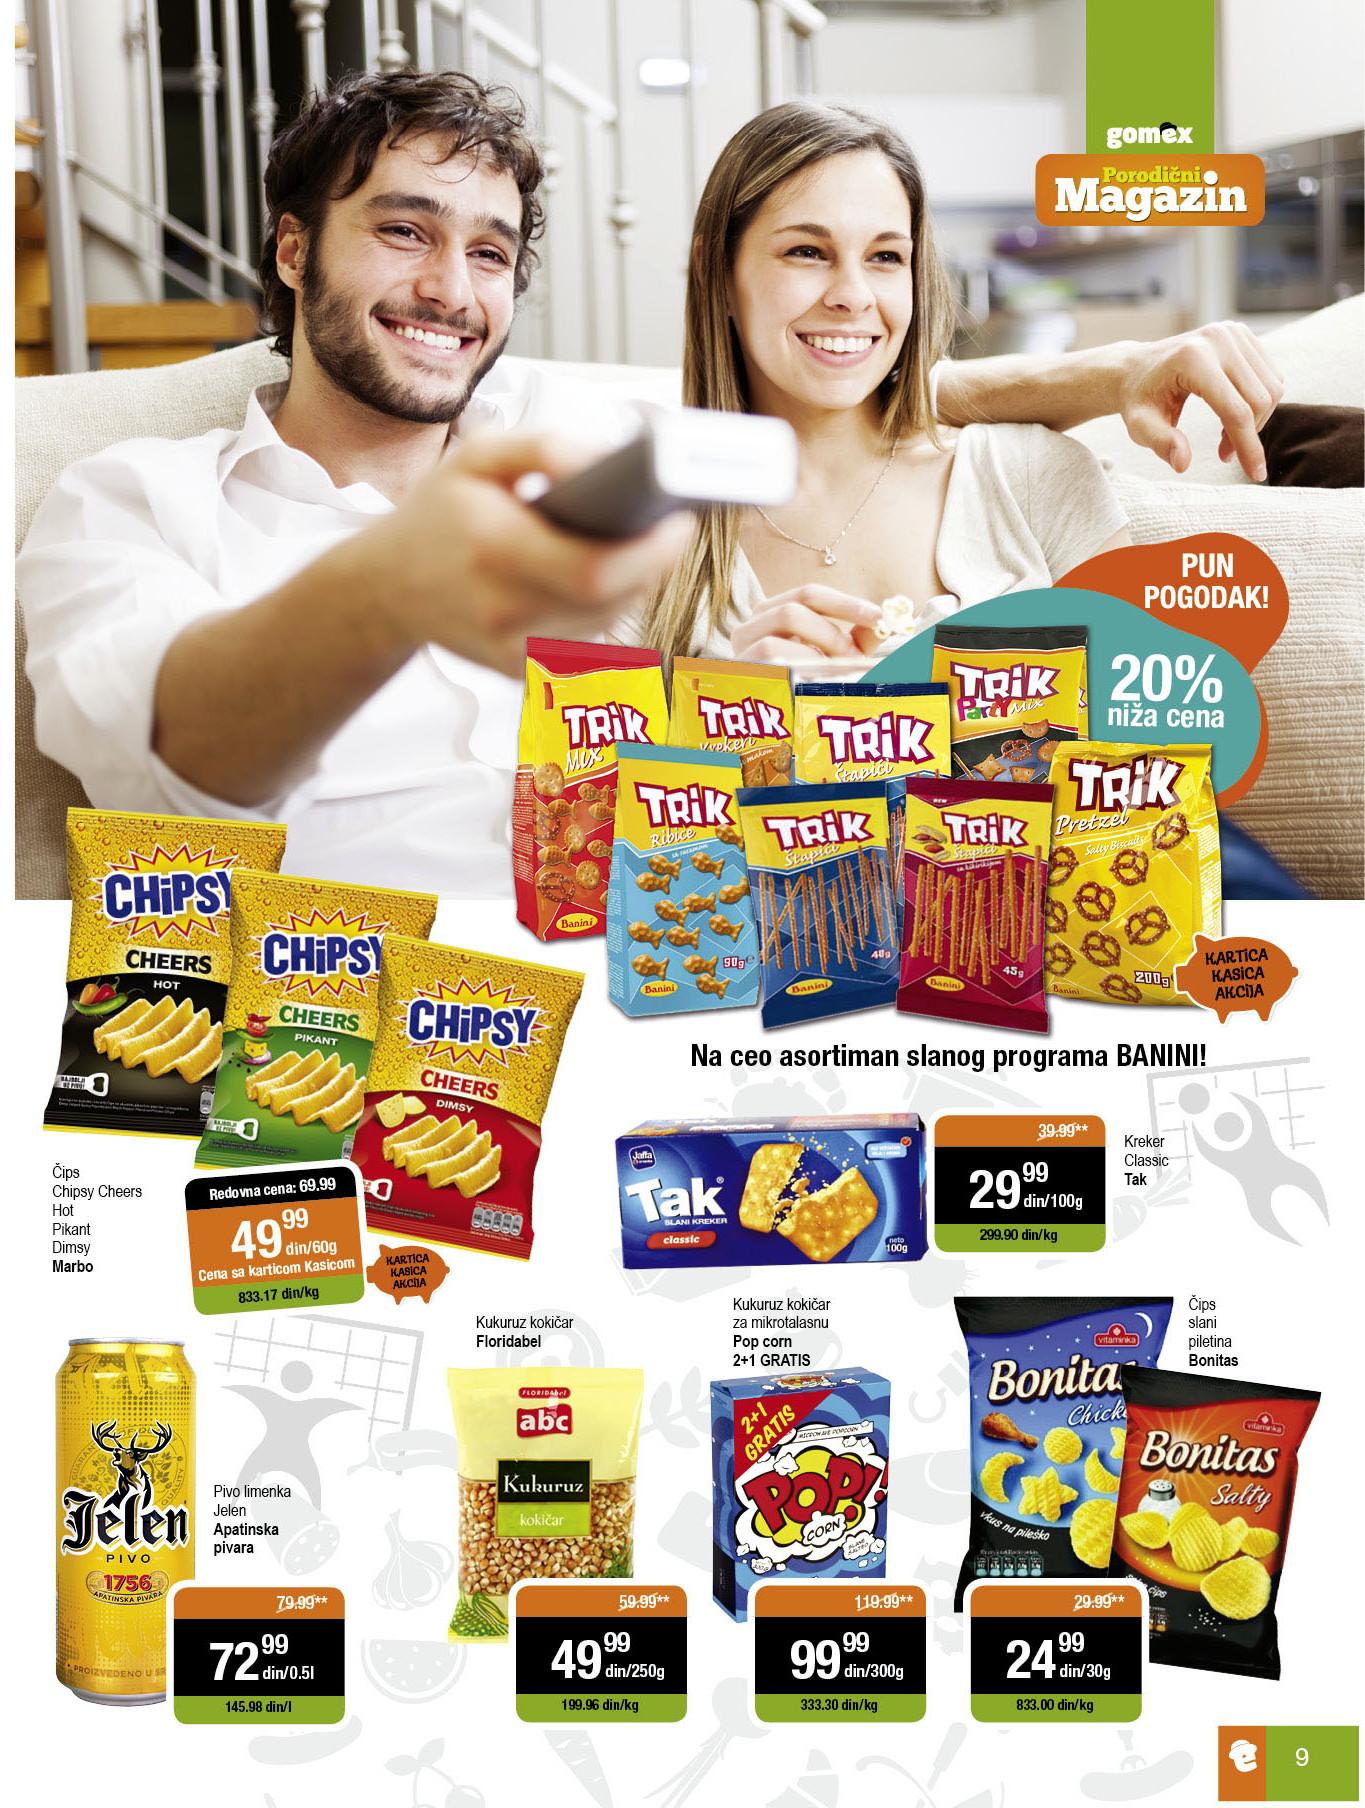 Gomex akcija mesto porodične kupovine